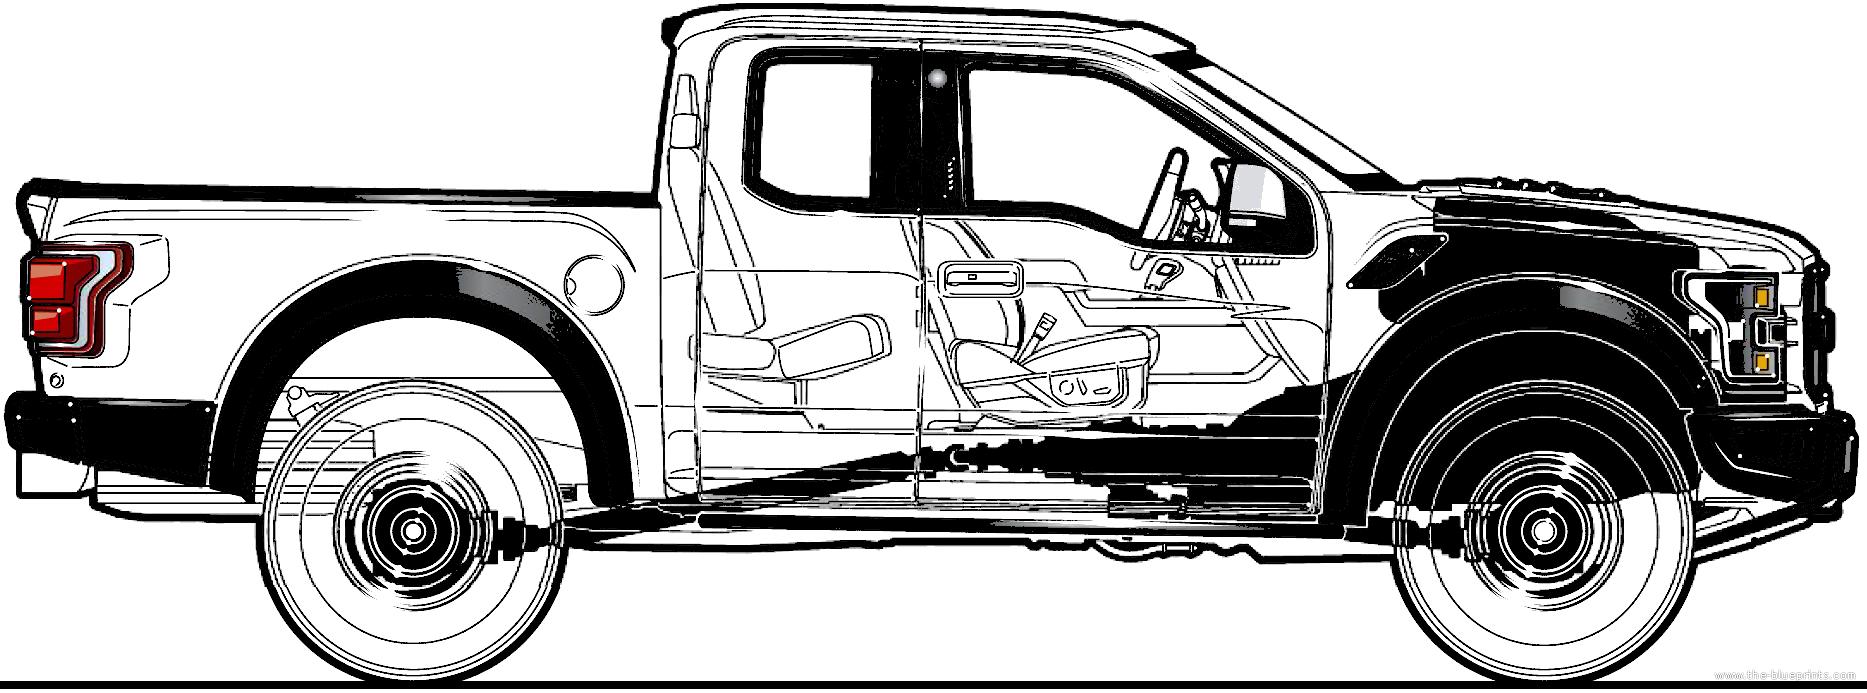 1867x693 Blueprints Gt Cars Gt Ford Gt Ford F 150 Raptor 4x4 Supercab (2017)